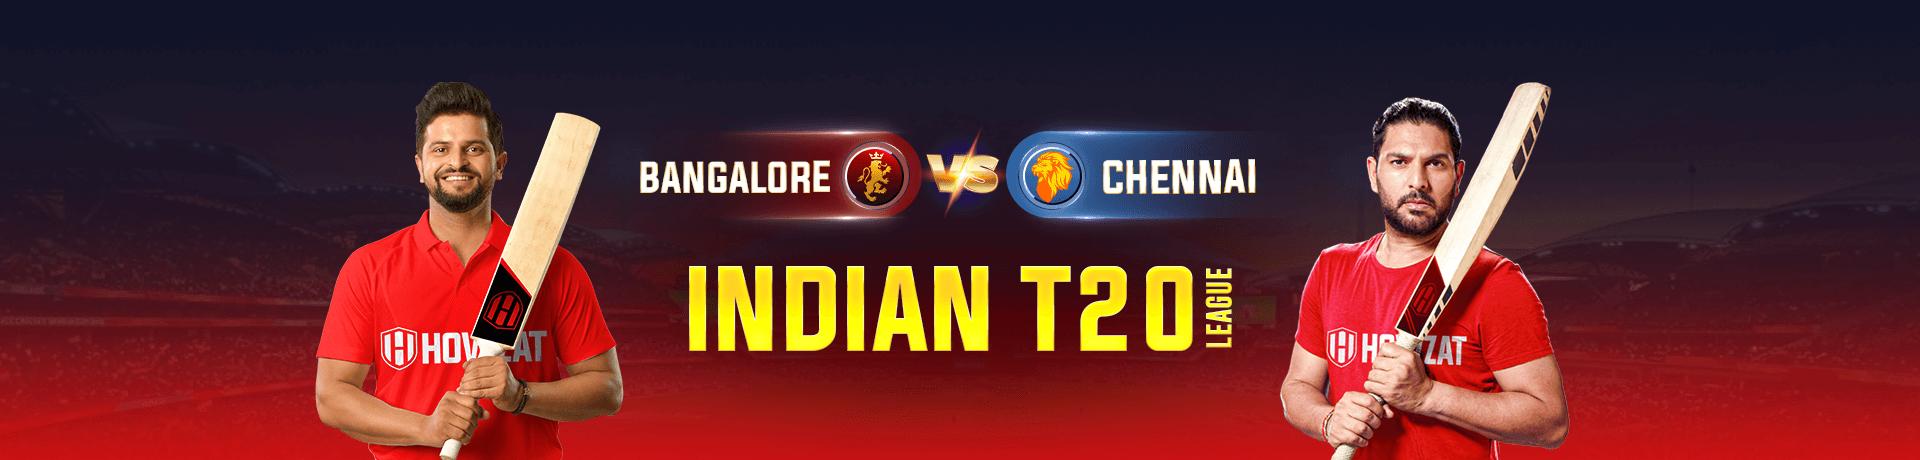 Bangalore vs Chennai Indian T20 League